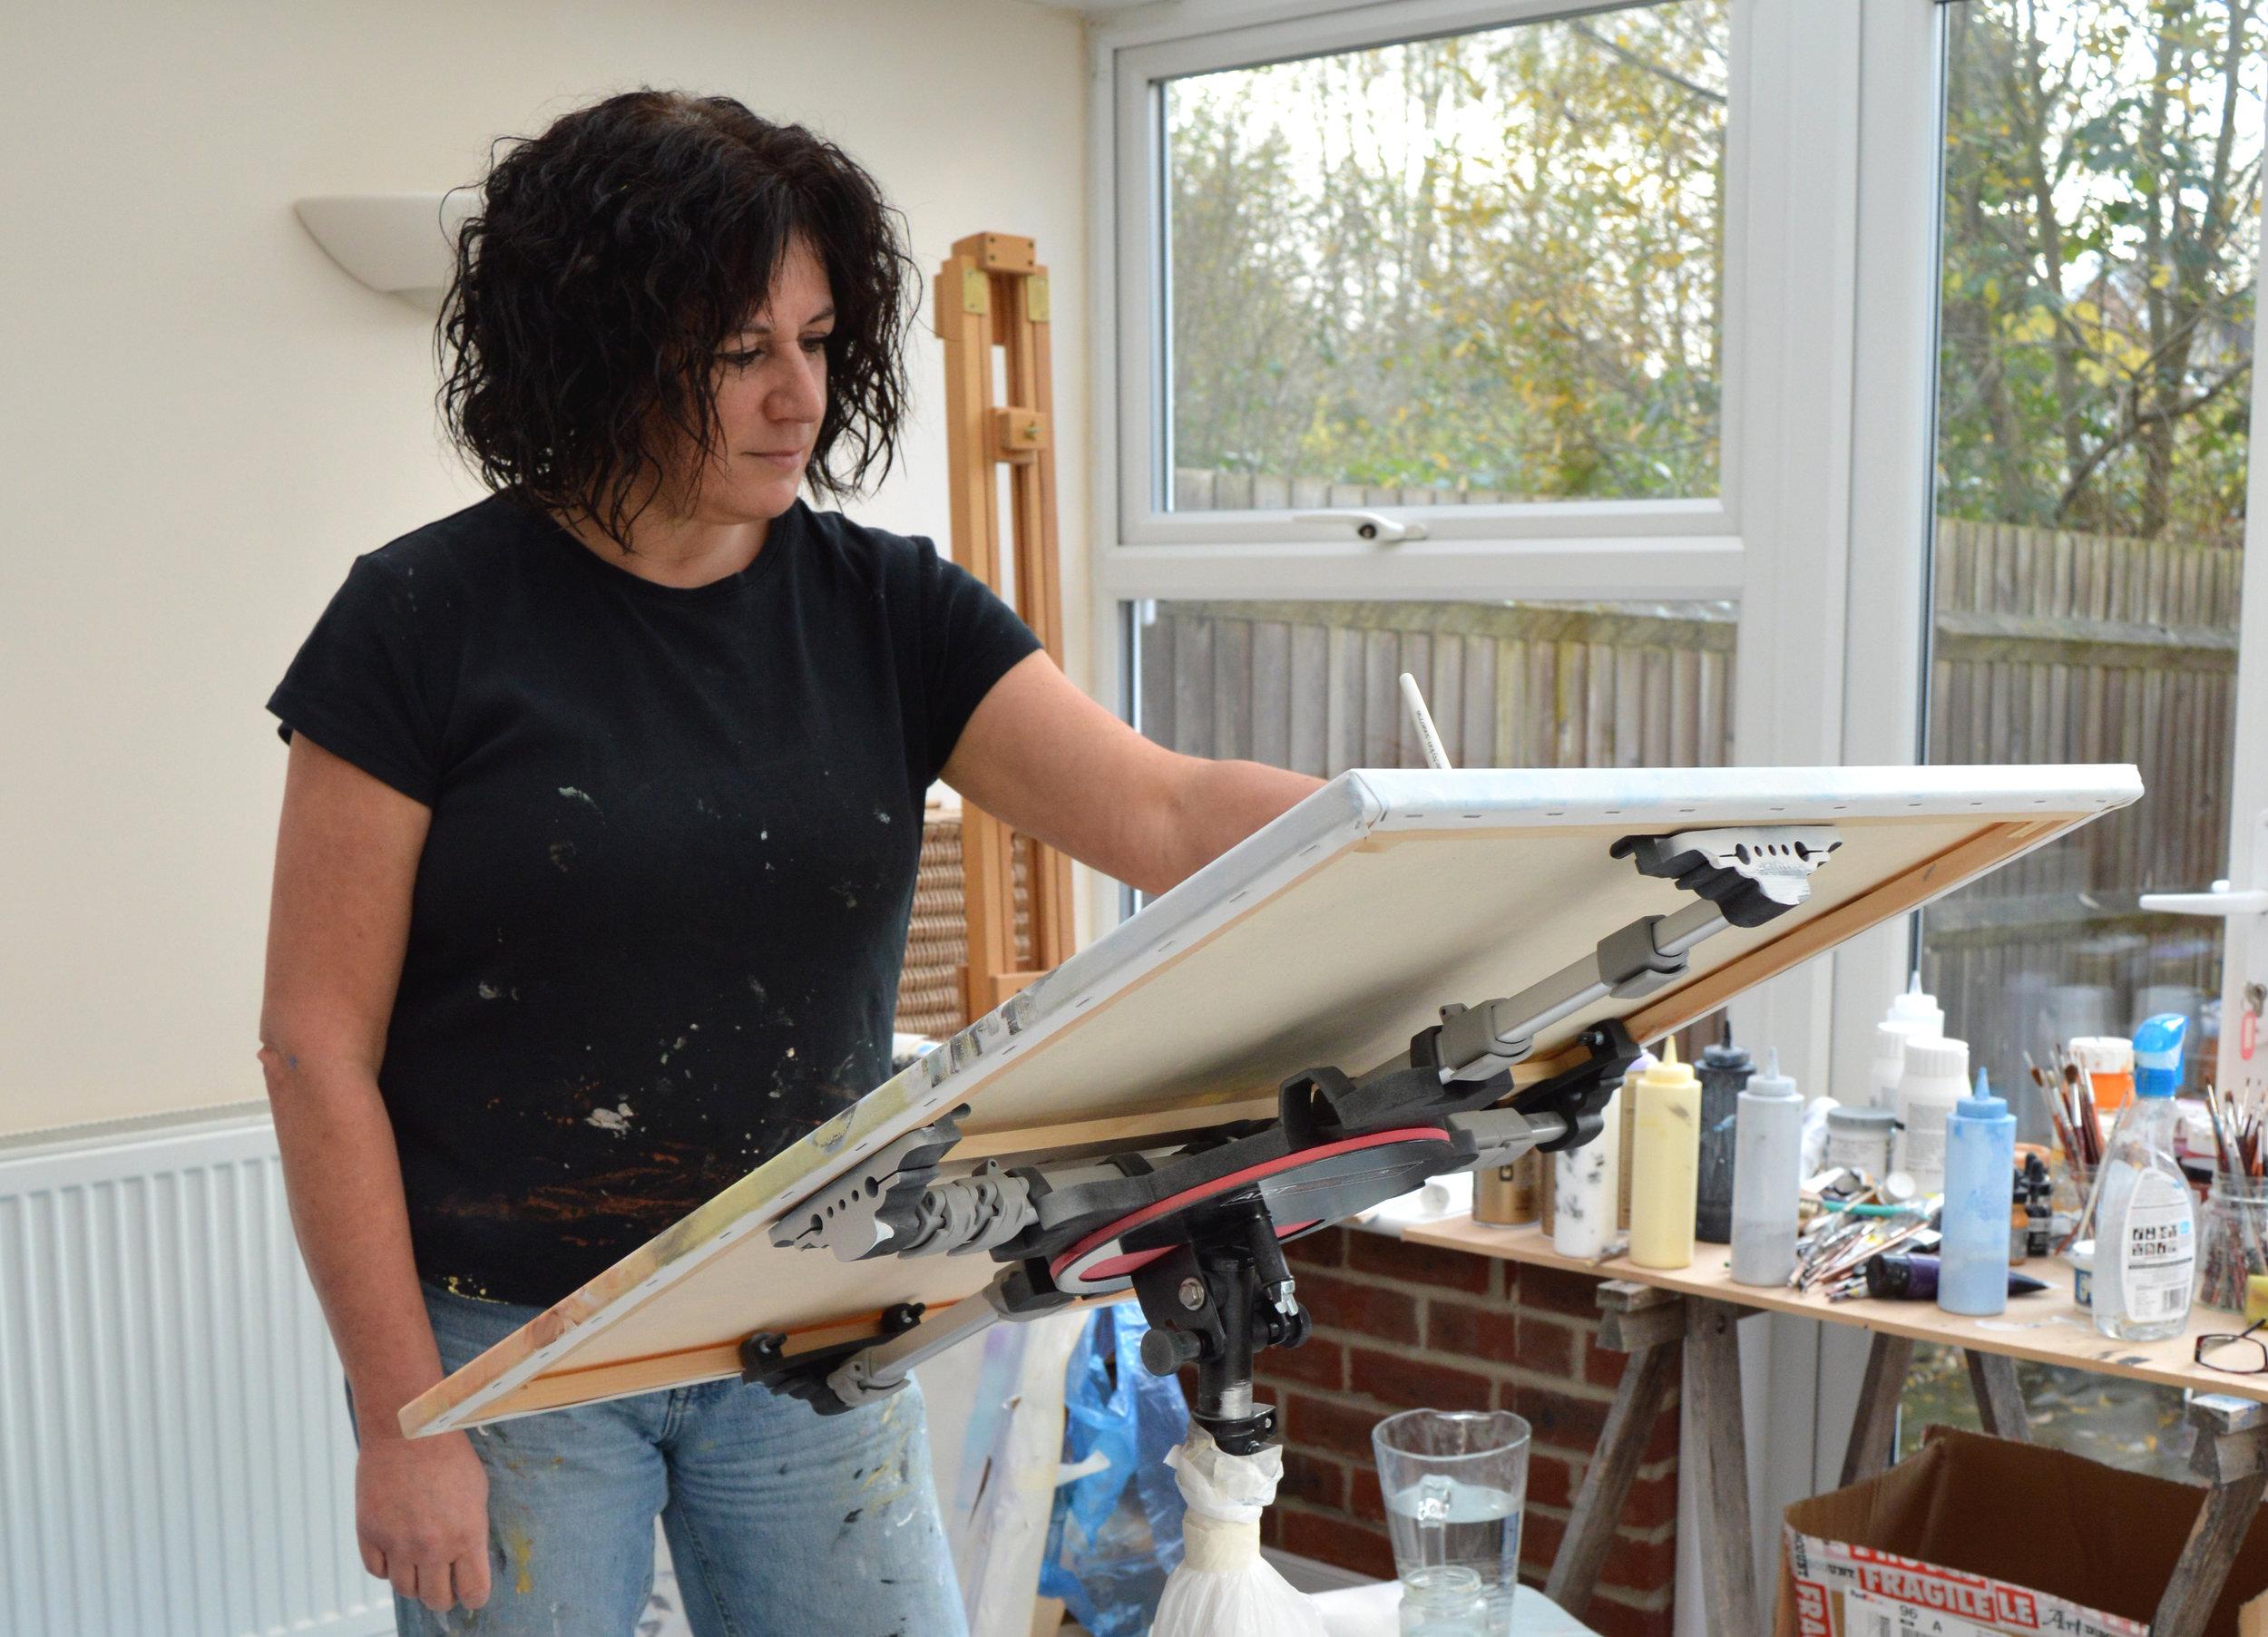 Lorraine Benton at the Little Van Gogh Artist Residency